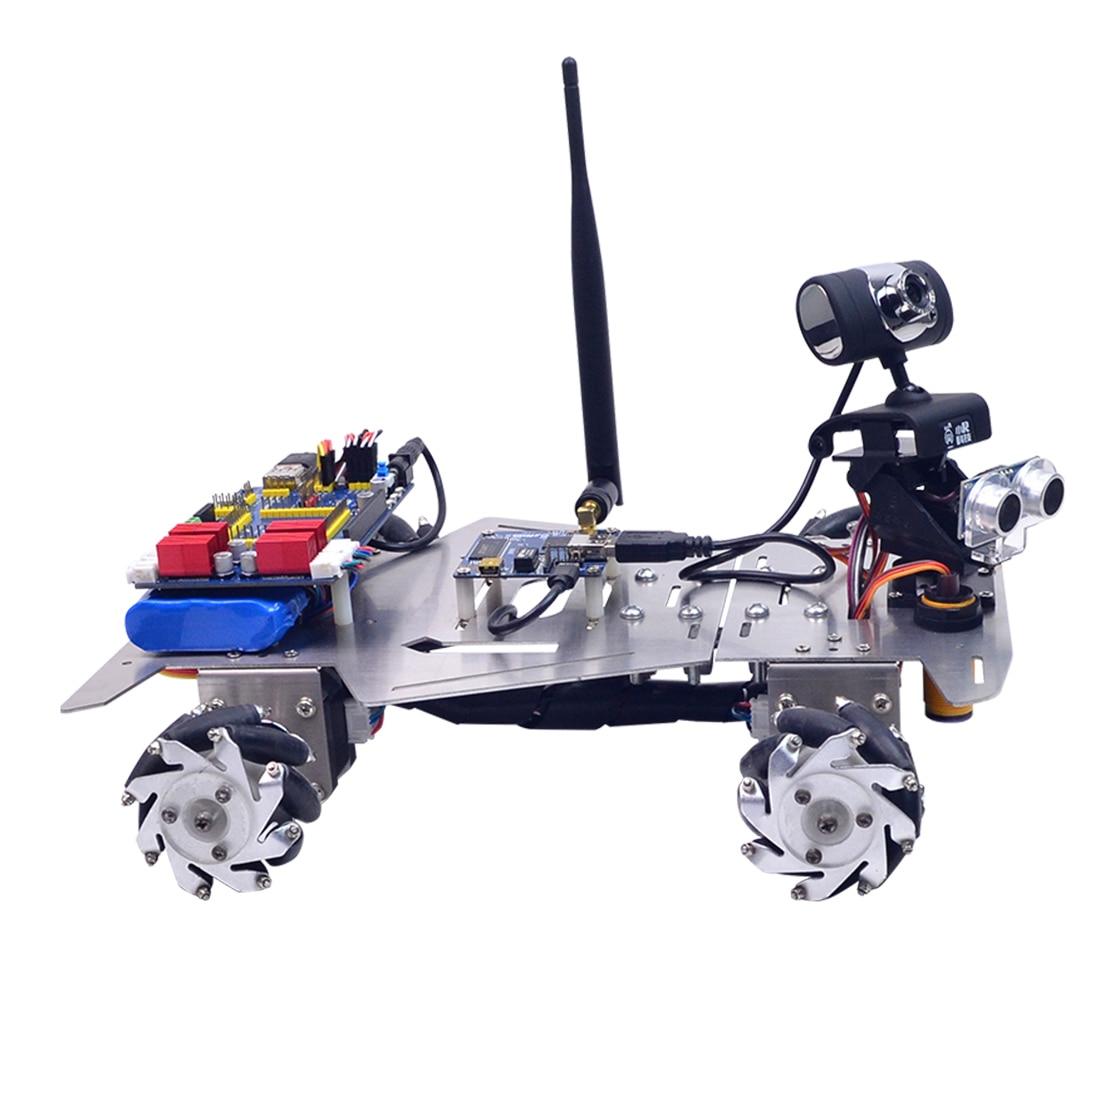 XR Master Omni-Directional Mecanum Wheel Robot Brain-Training Toy Children Education Toys -WIFI + Bluetooth Version/WIFI Version